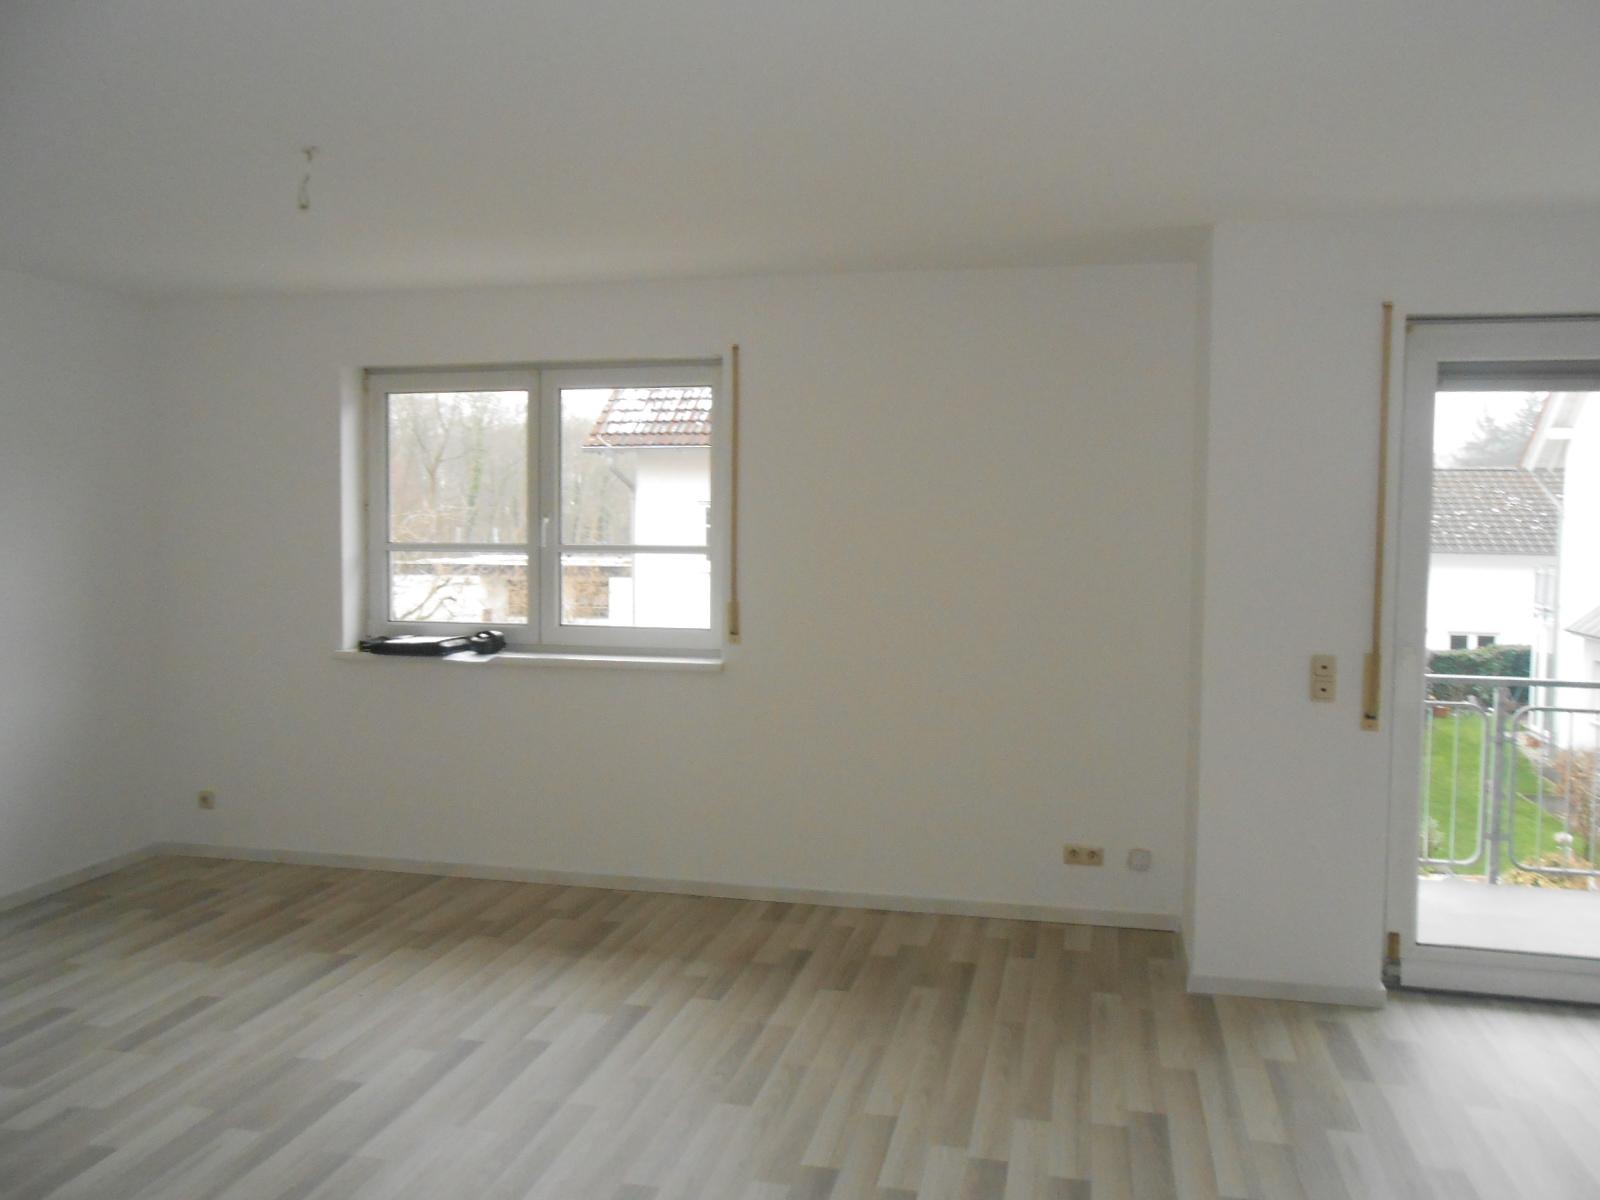 64331 weiterstadt ot moderne 3 zi etw mit fu bodenhzg. Black Bedroom Furniture Sets. Home Design Ideas